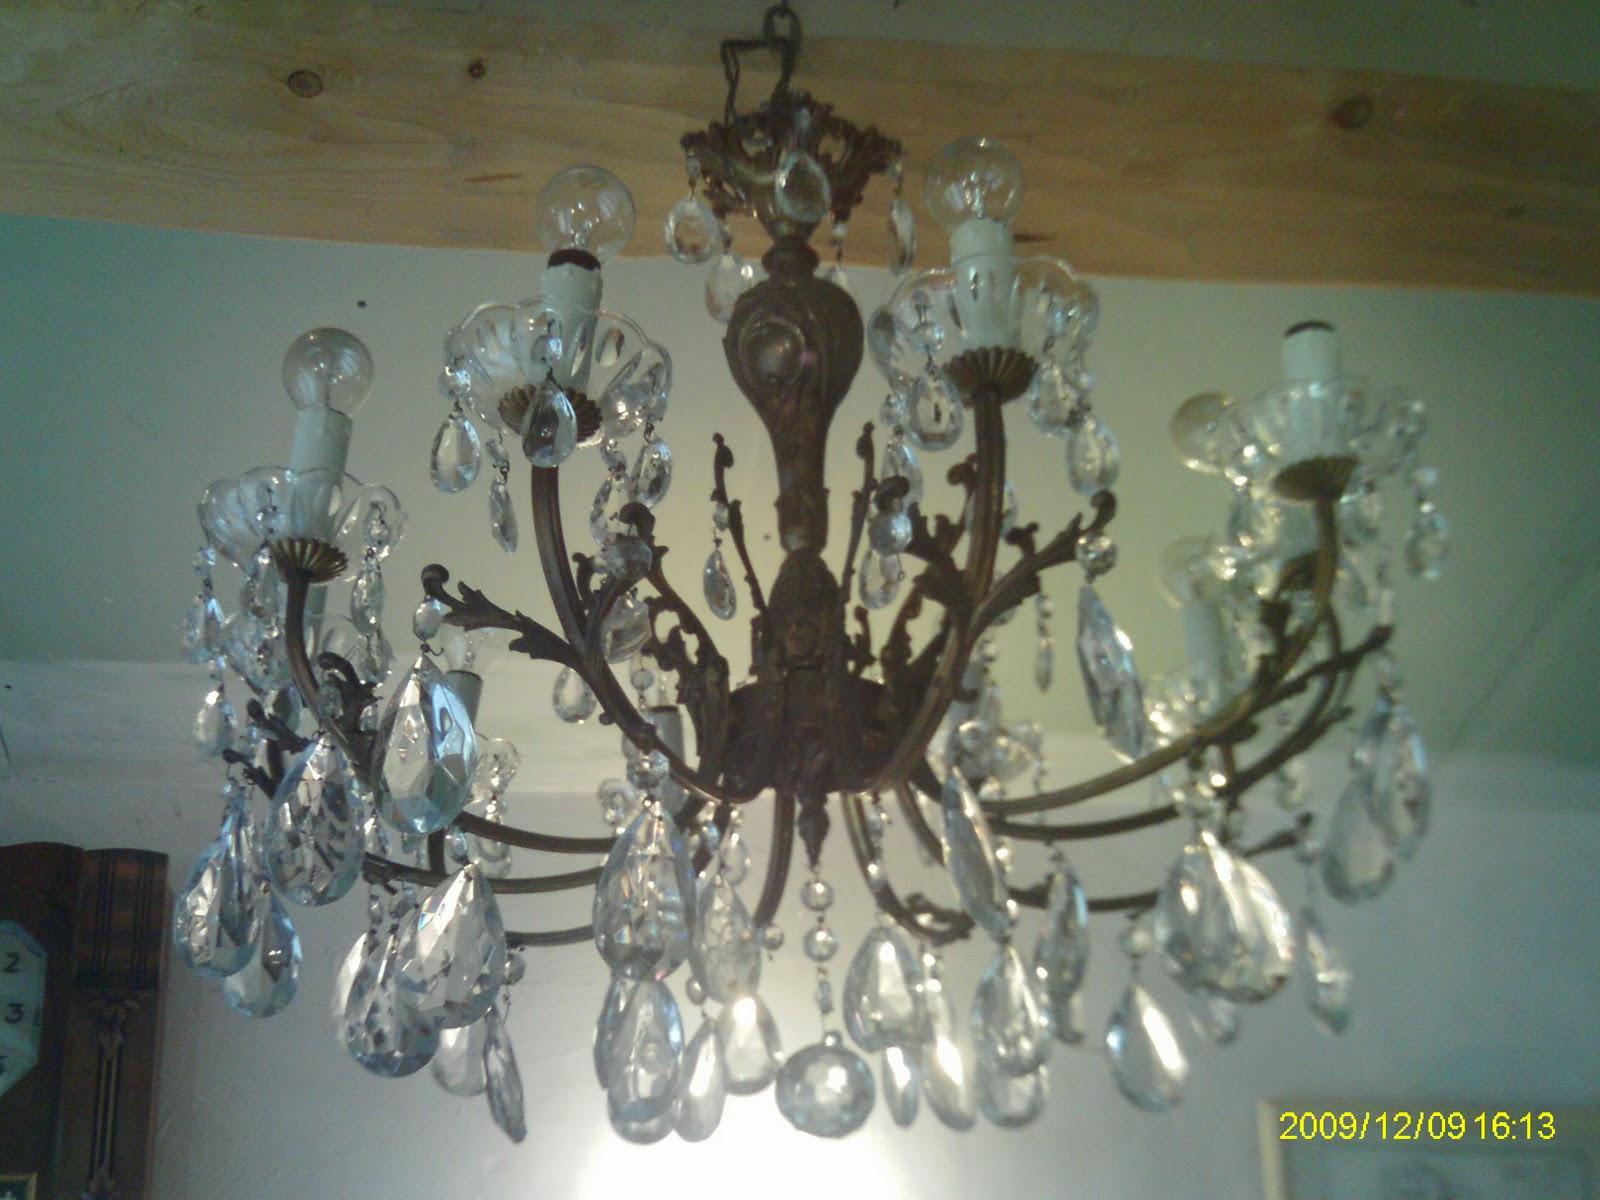 ancien immense lustre a pampilles marie theres 10 bras de lumiere. Black Bedroom Furniture Sets. Home Design Ideas